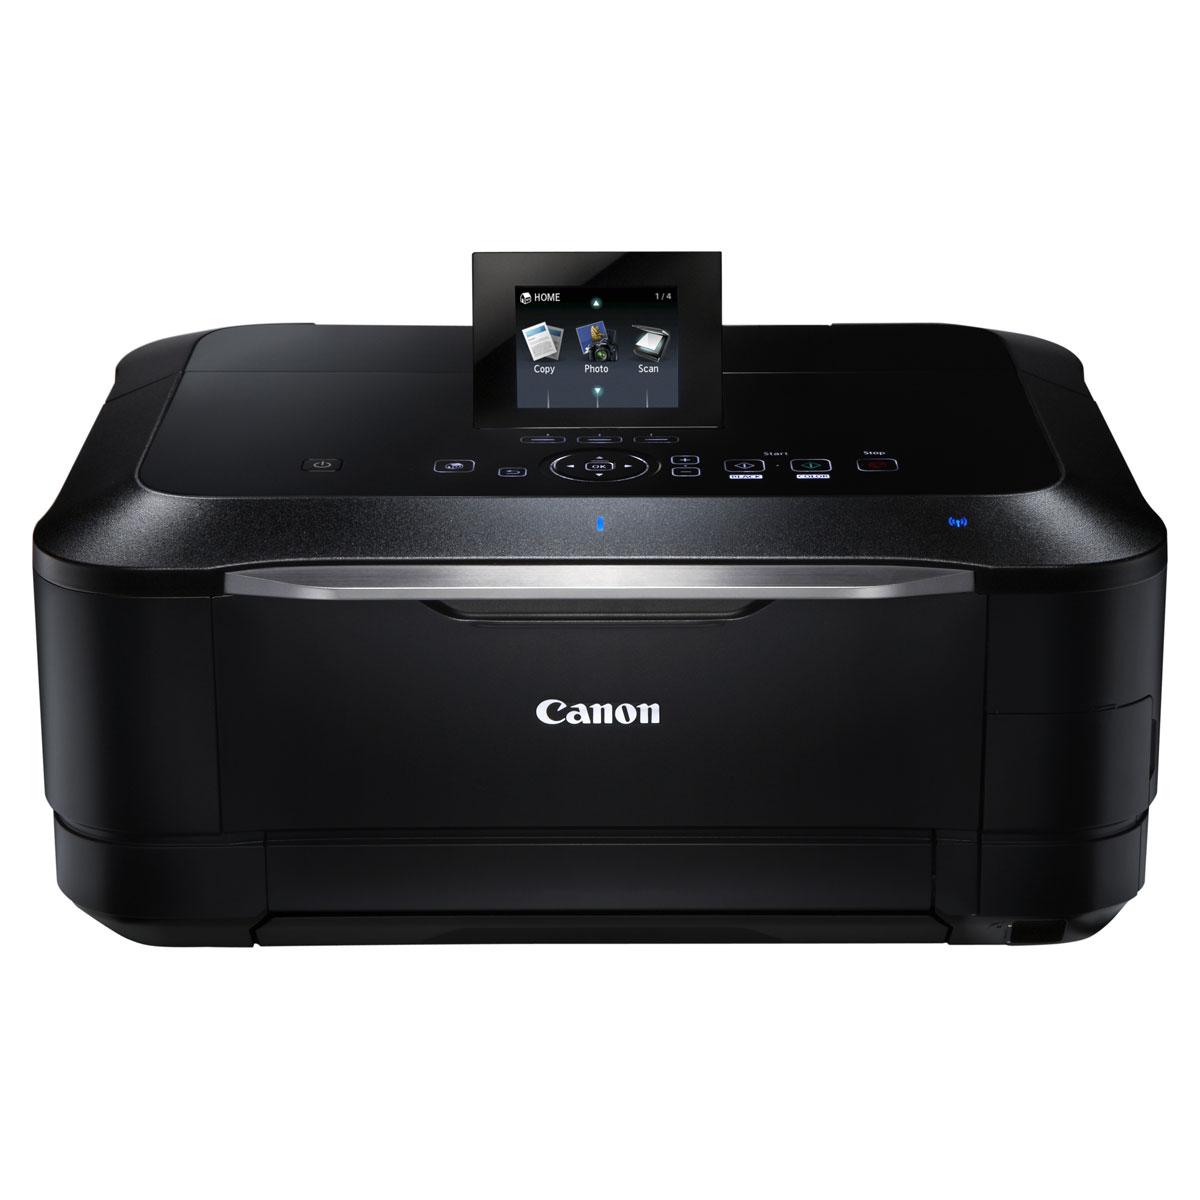 canon pixma mg8250 imprimante multifonction canon sur. Black Bedroom Furniture Sets. Home Design Ideas